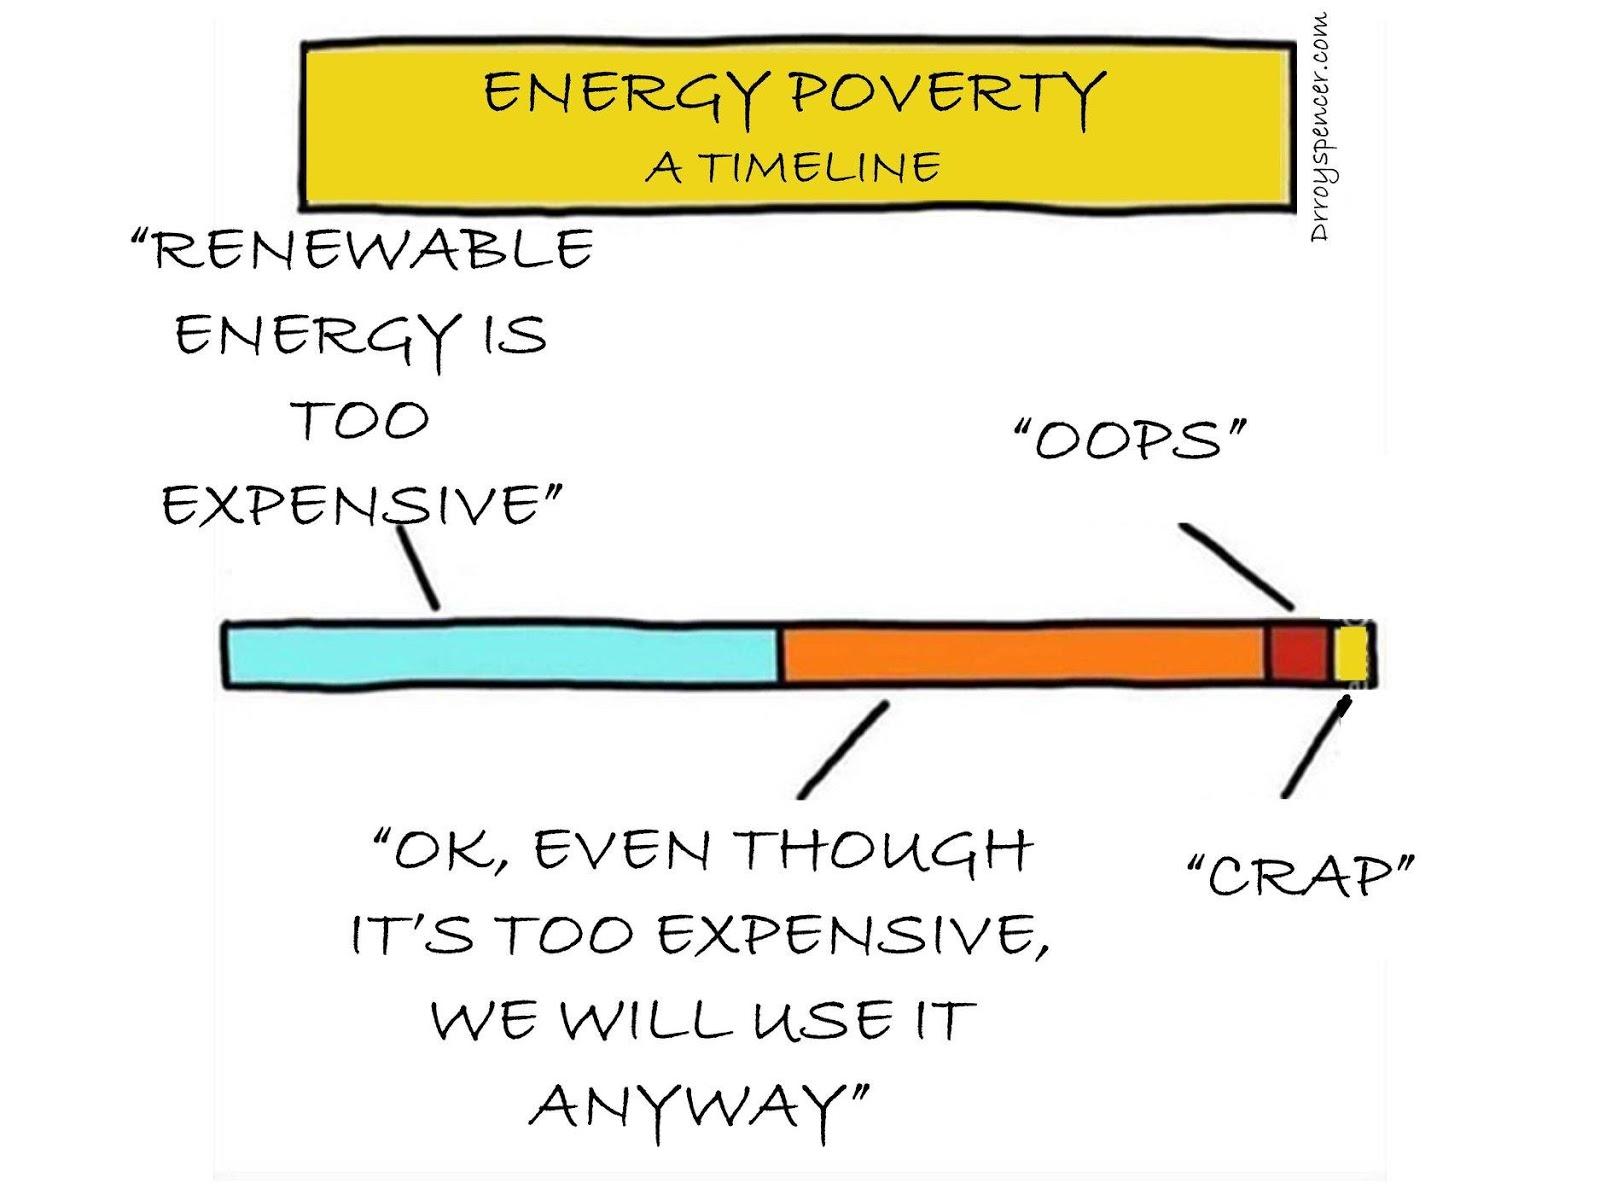 Energy poverty timeline meme